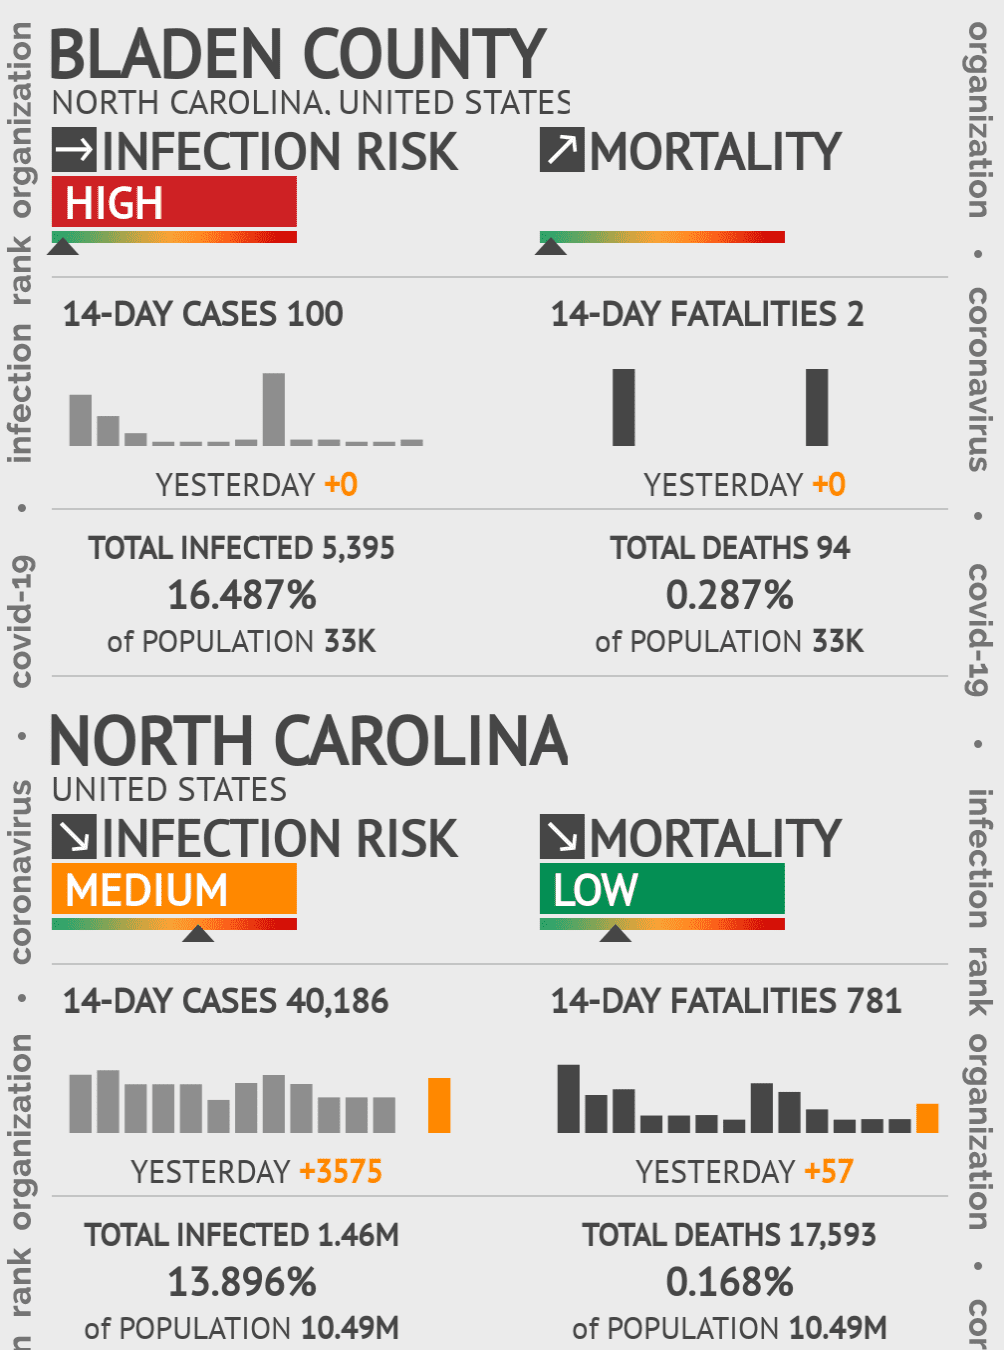 Bladen County Coronavirus Covid-19 Risk of Infection on November 29, 2020